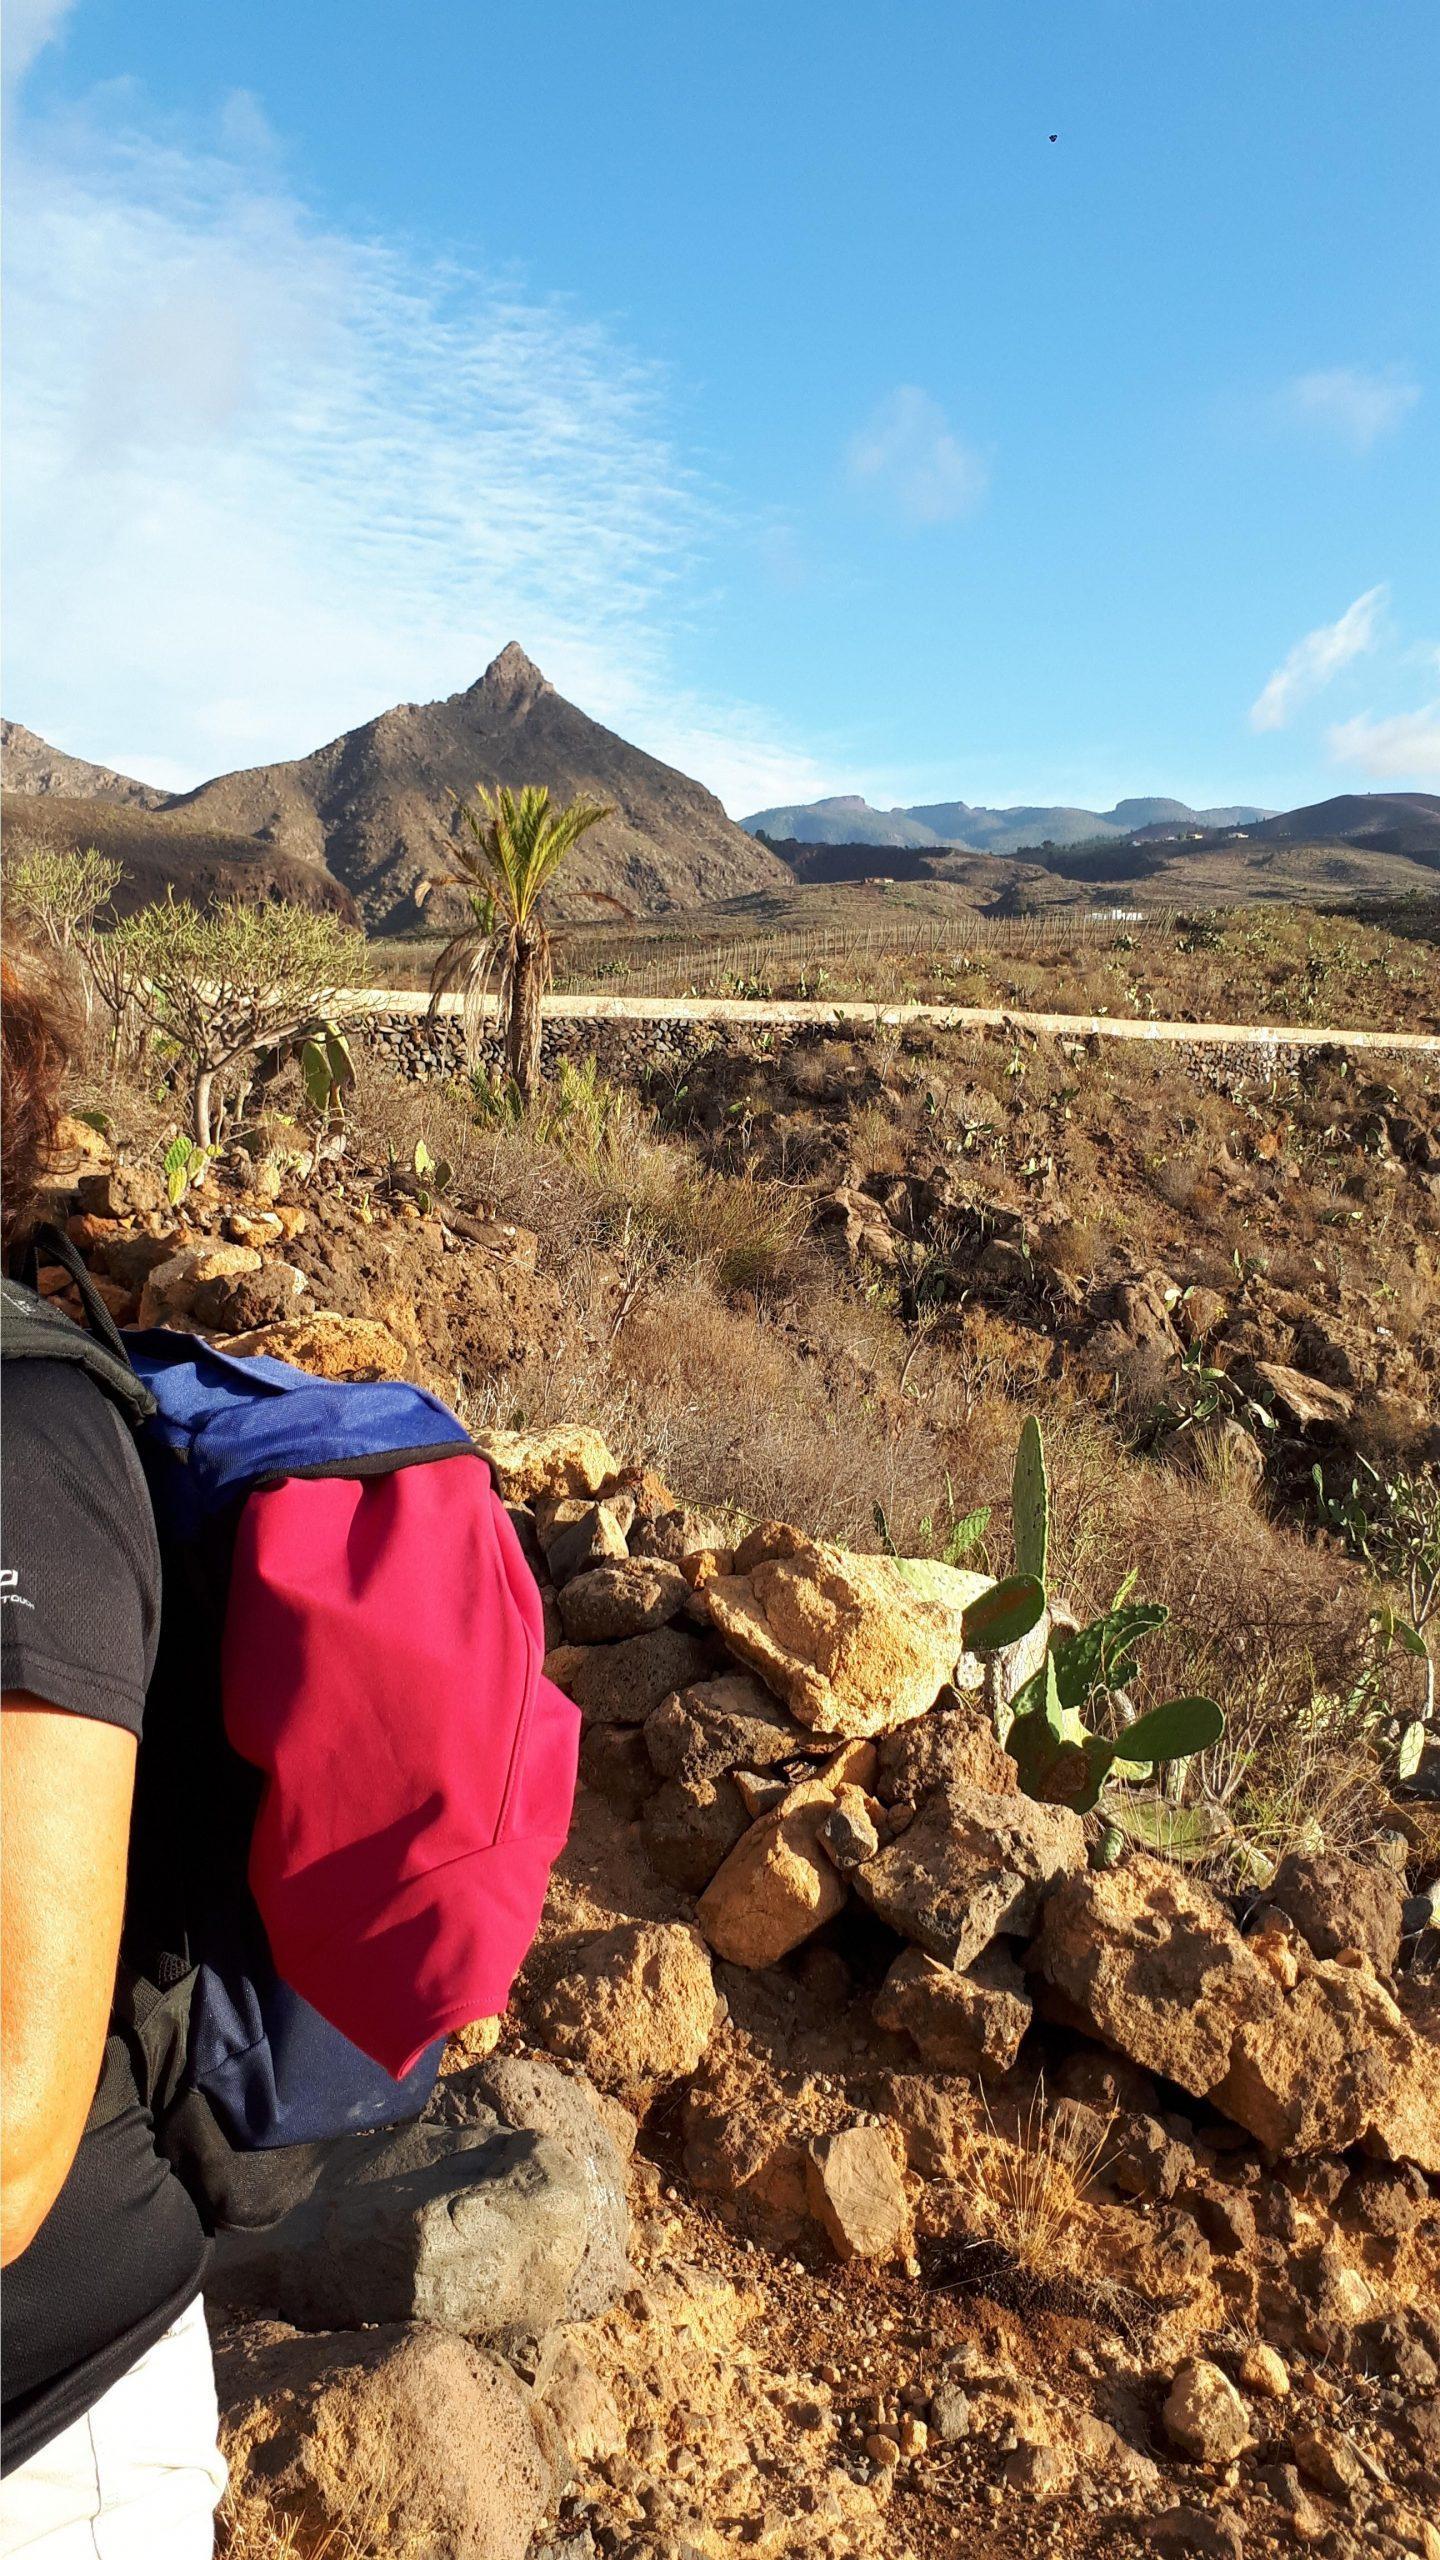 Start Wanderung Arona - Los Roques